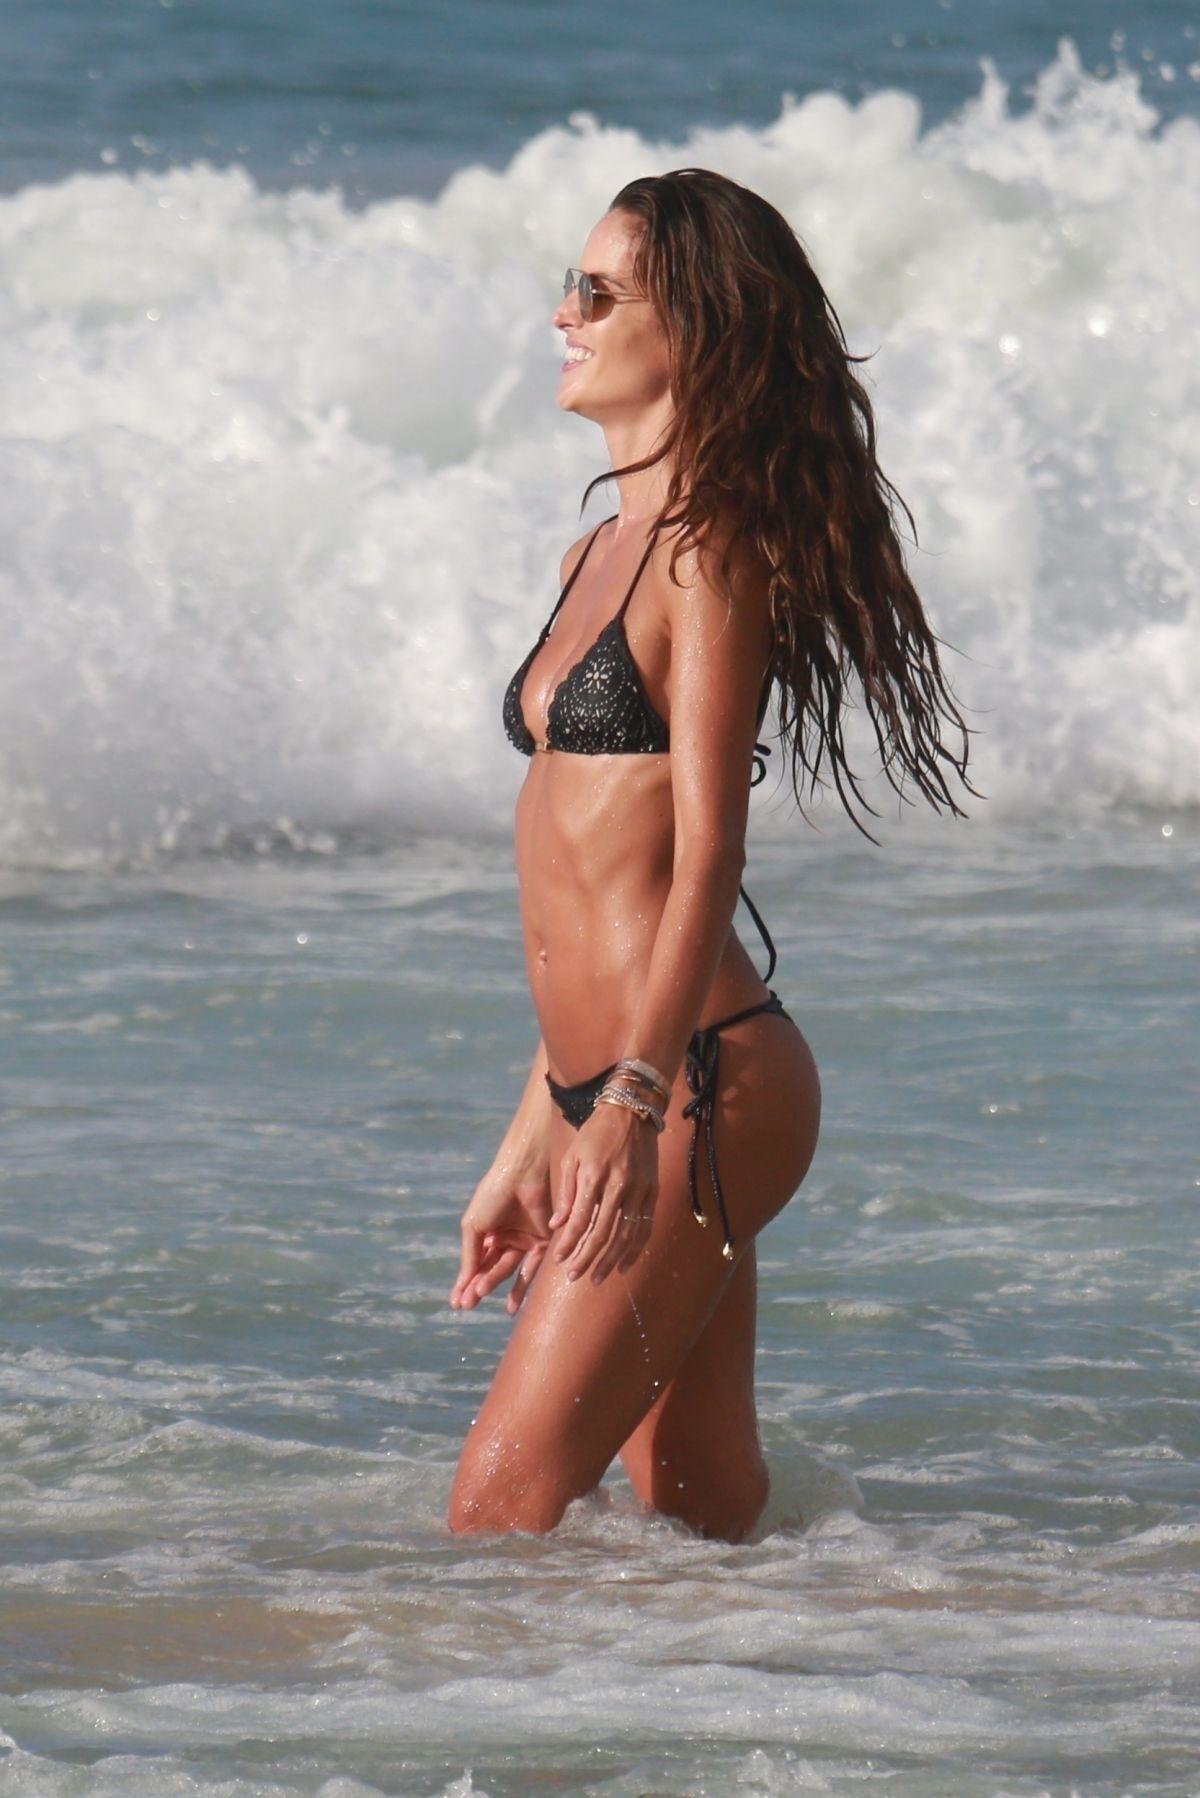 Izabel Goulart in Bikini and Kevin Trapp on the beach in Fernando de Noronha Pic 31 of 35